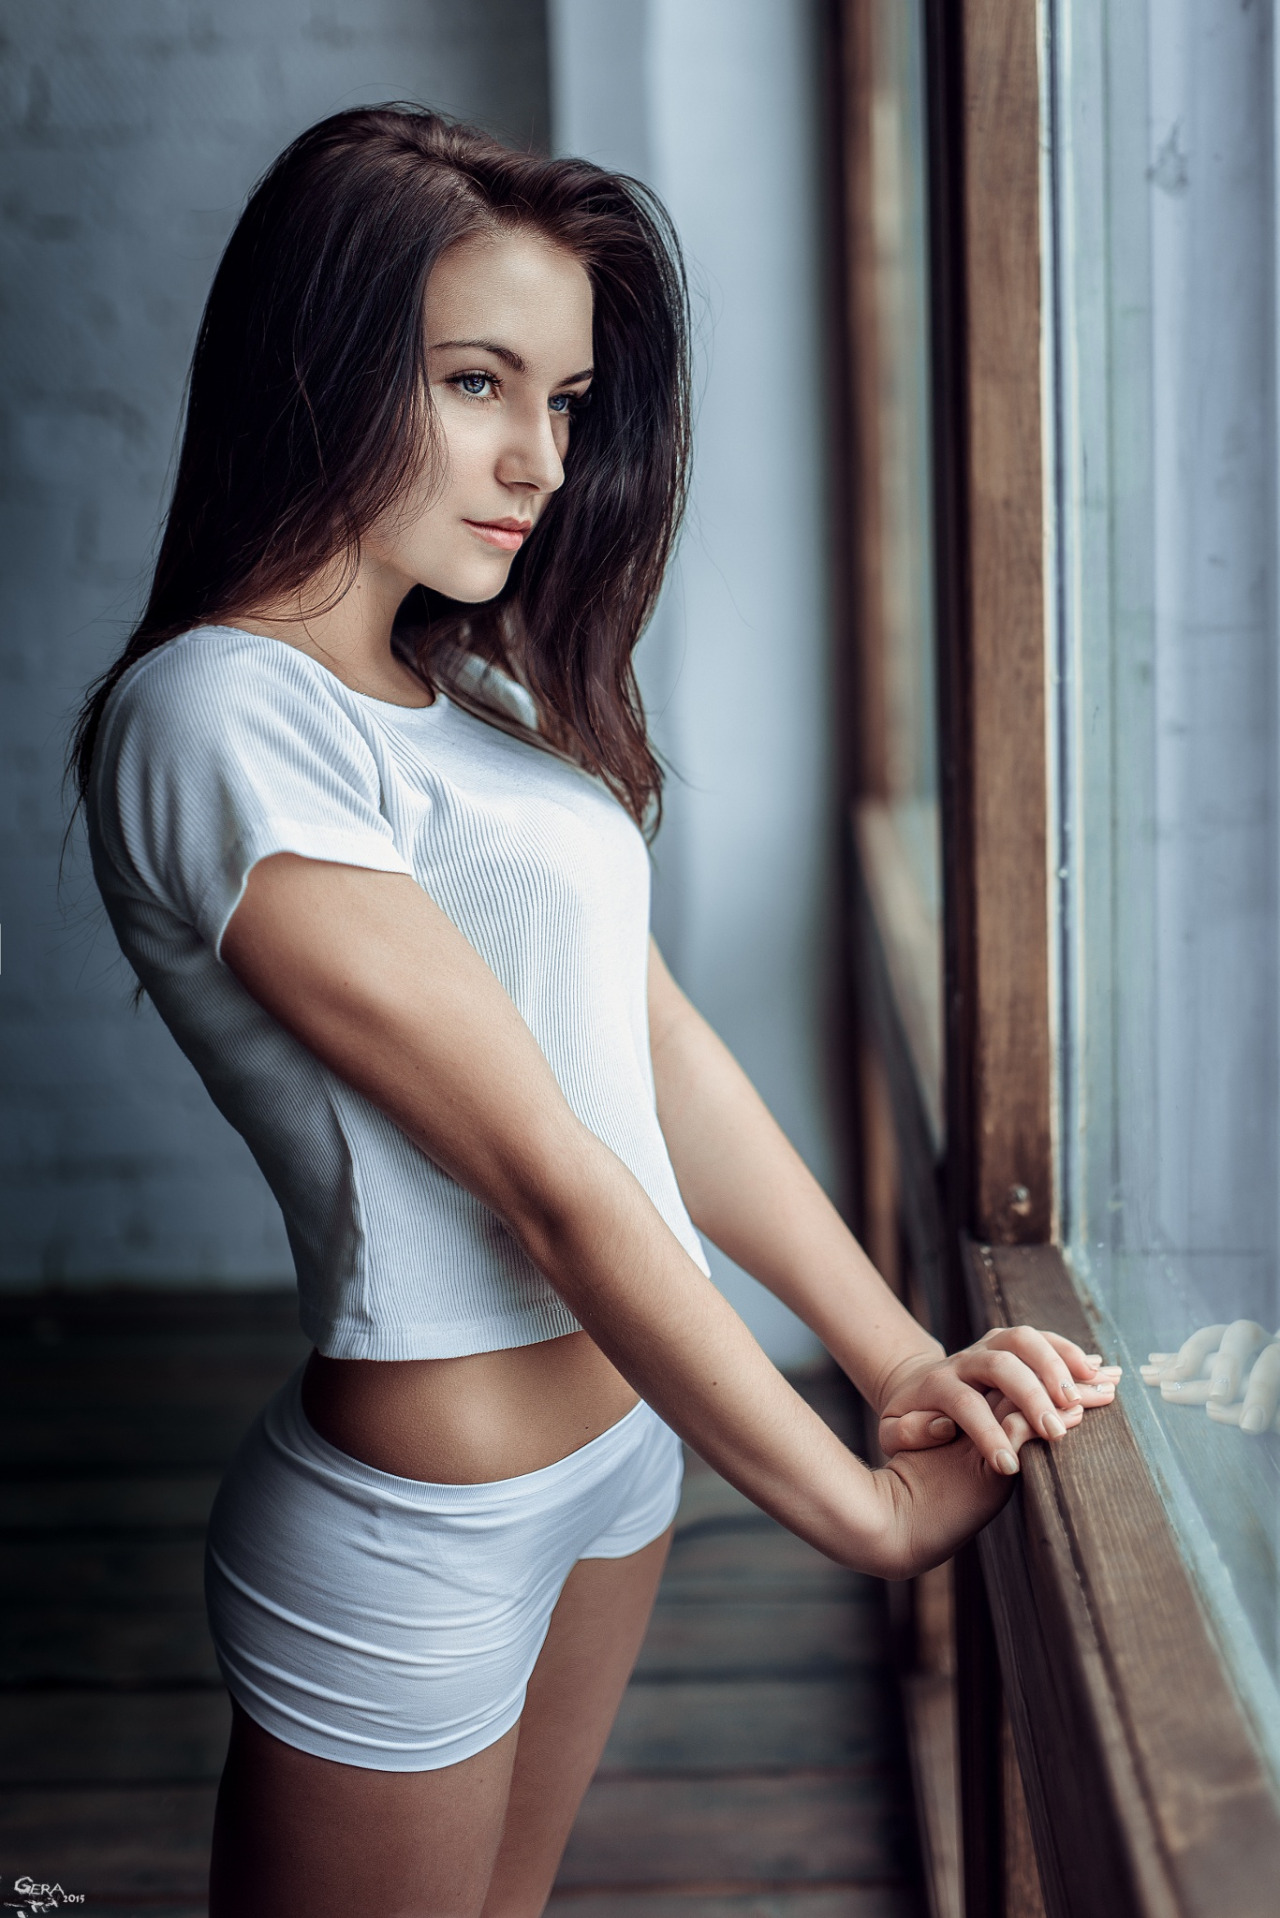 Constance Wu Nude - Barnorama